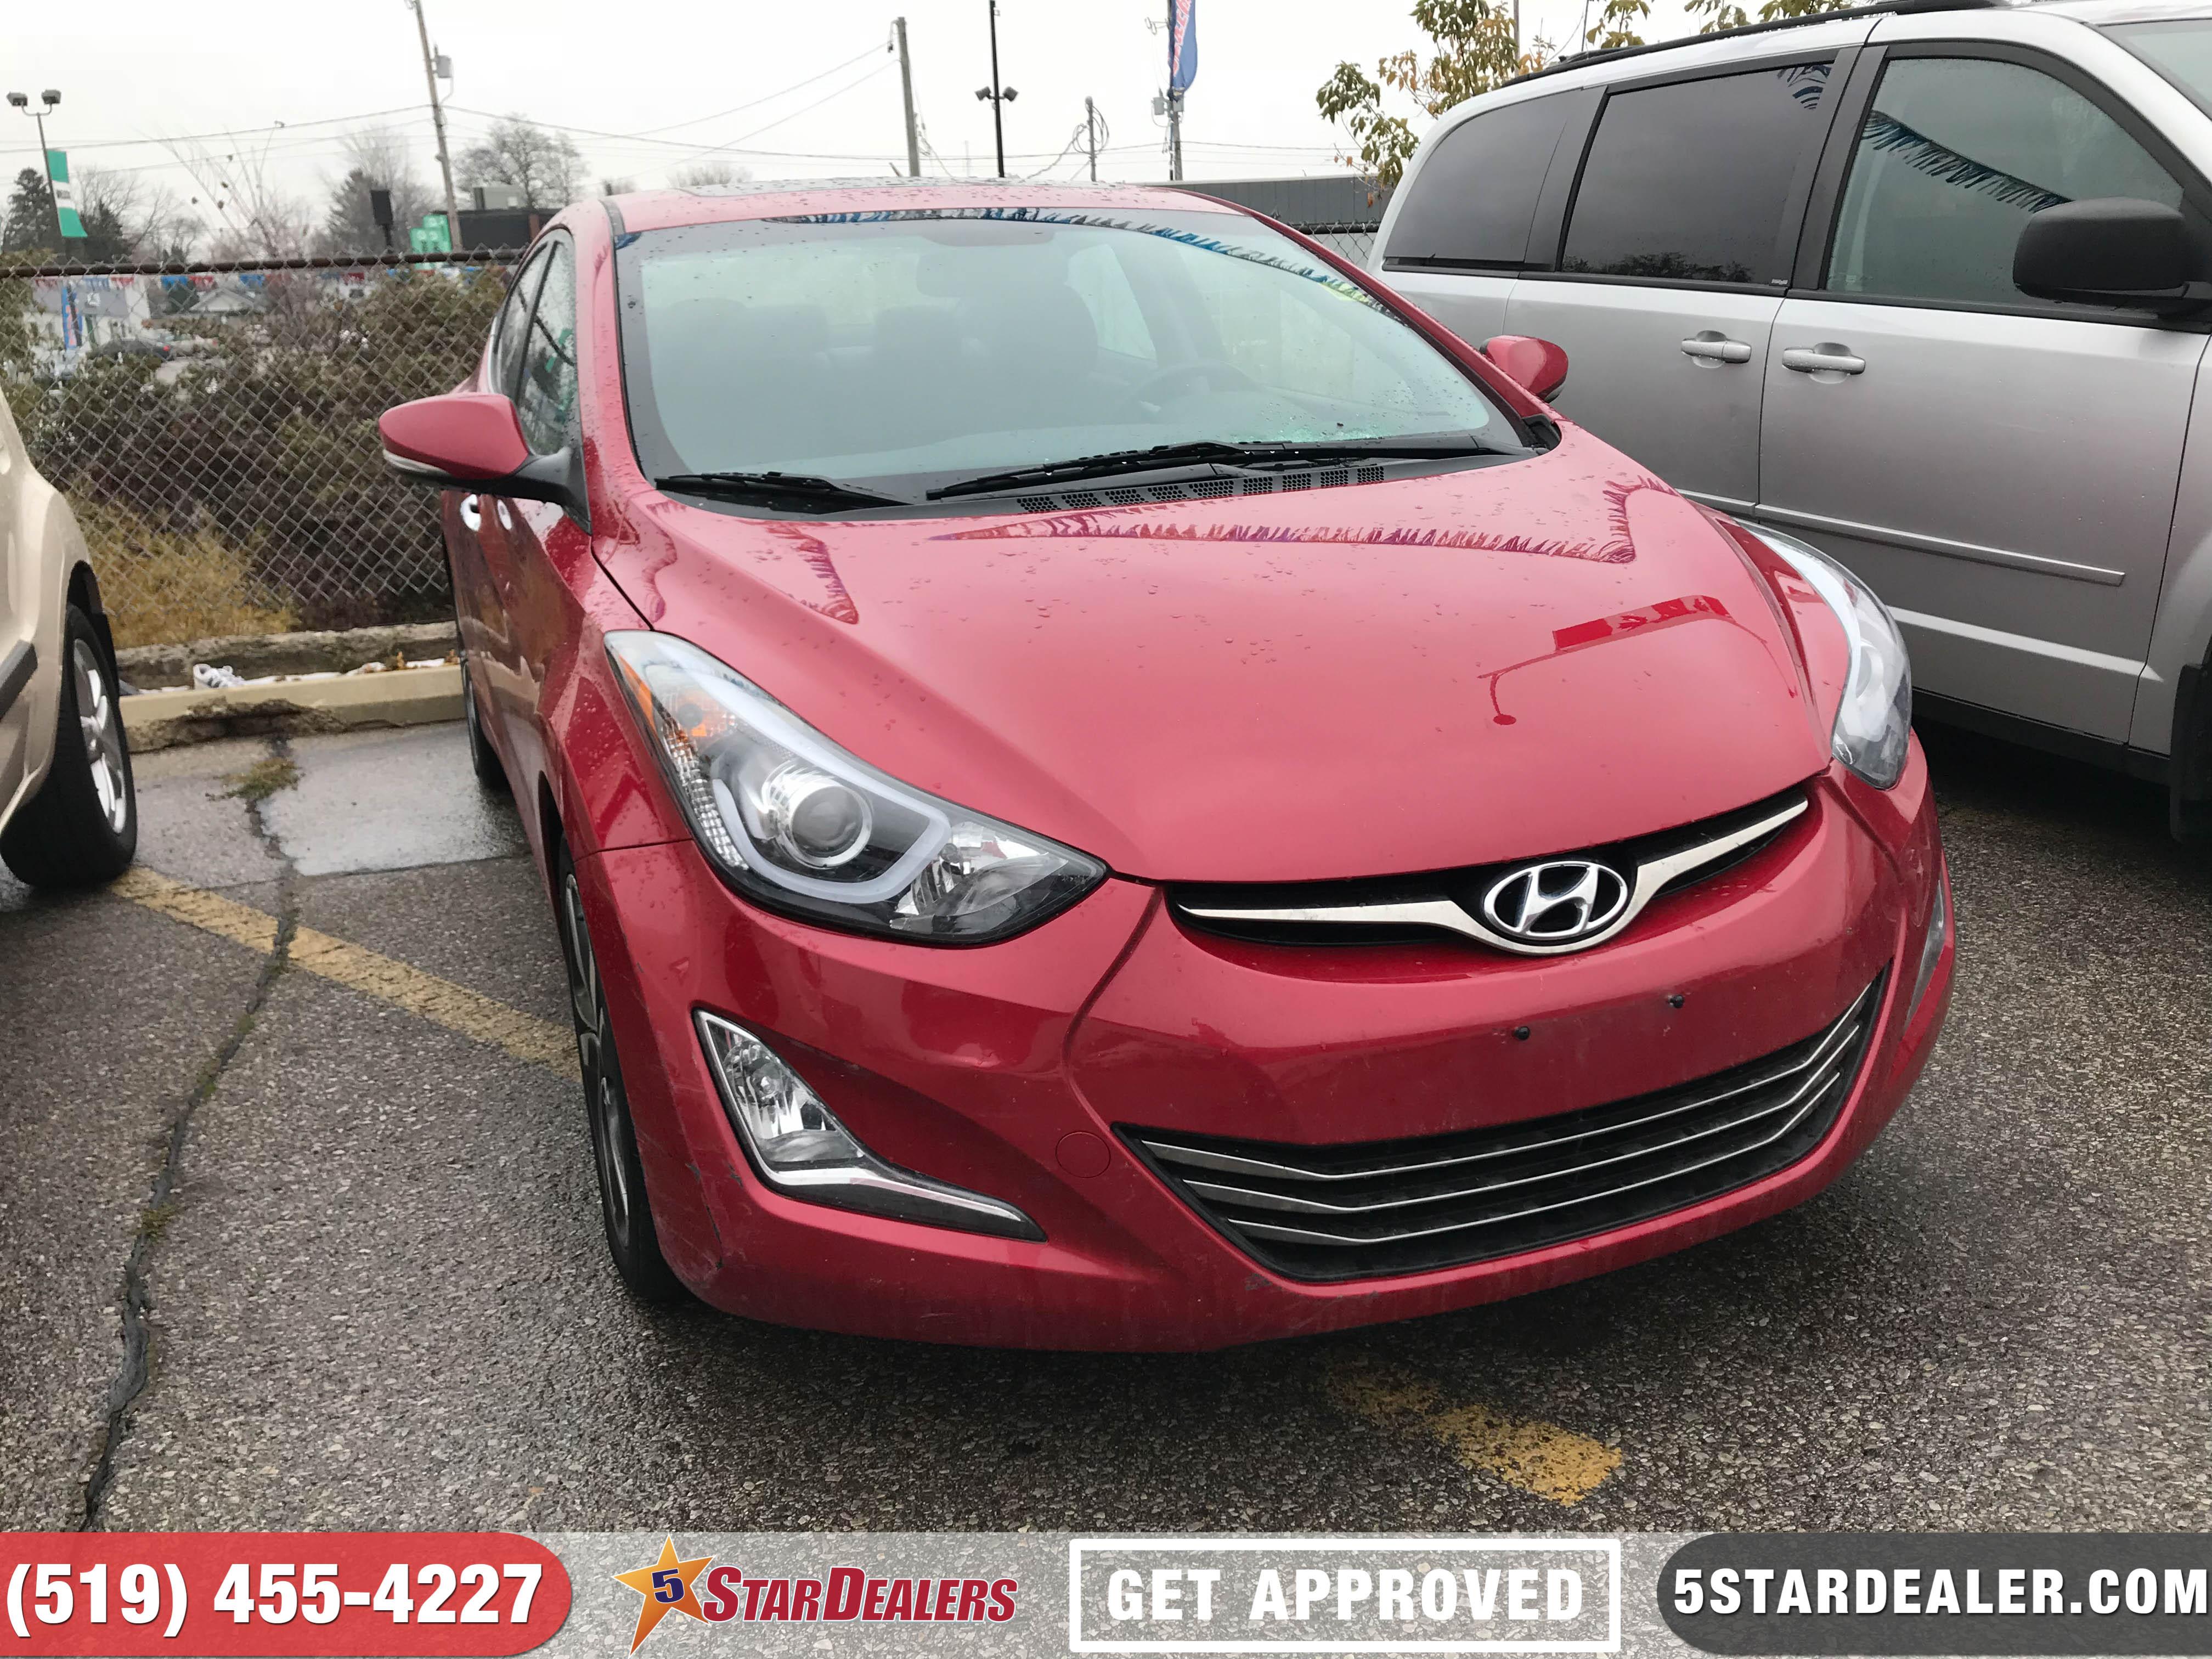 Used 2015 Hyundai Elantra For Sale